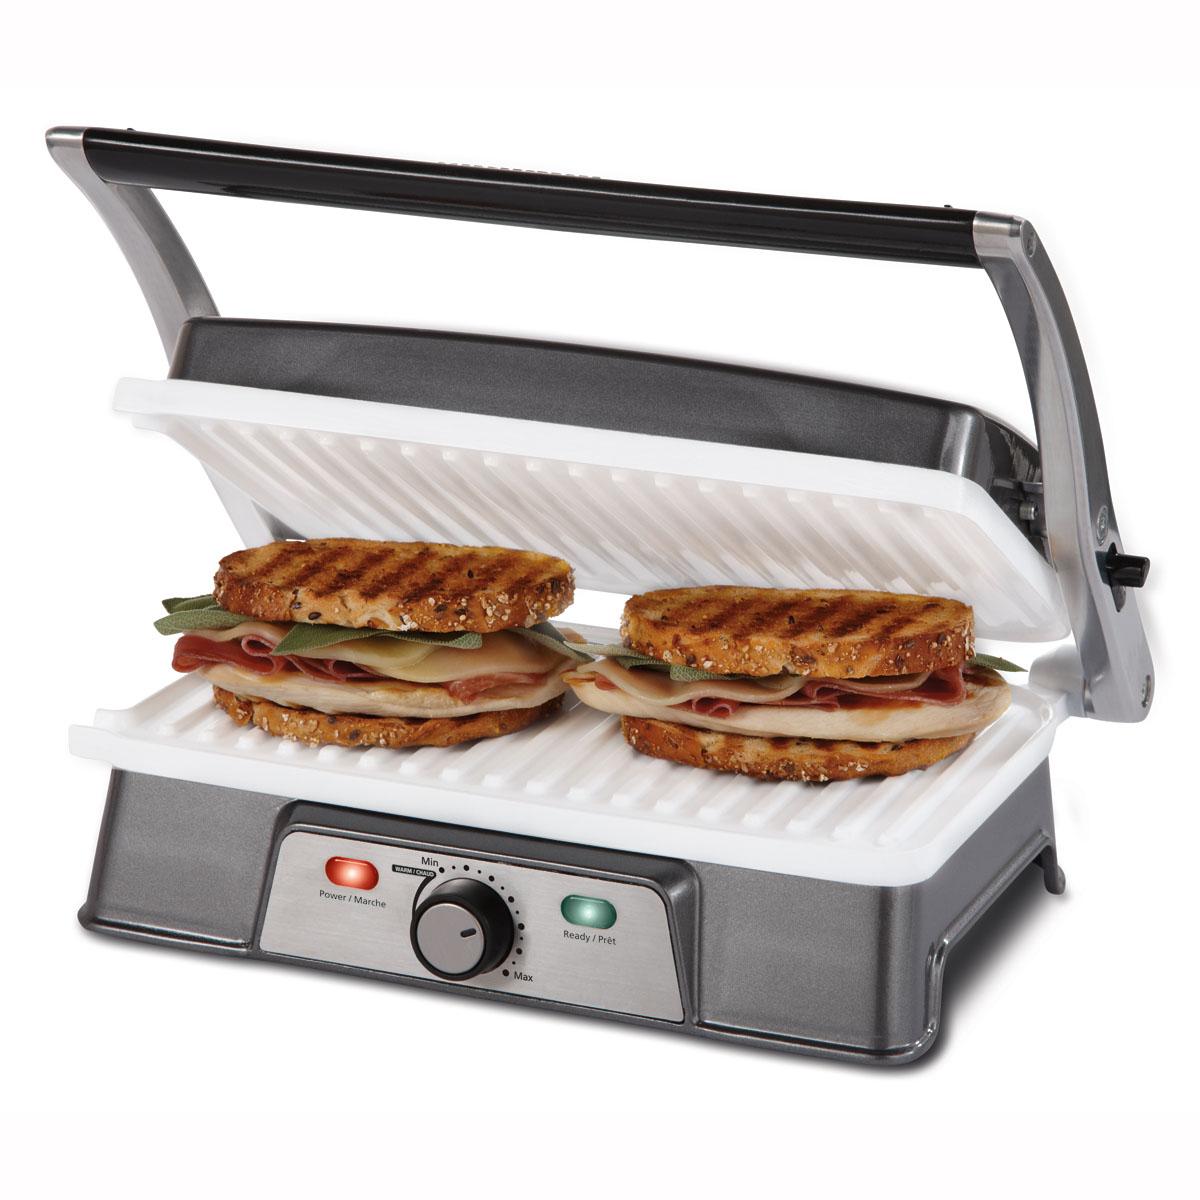 Oster® DuraCeramic™ Panini Maker & Grill